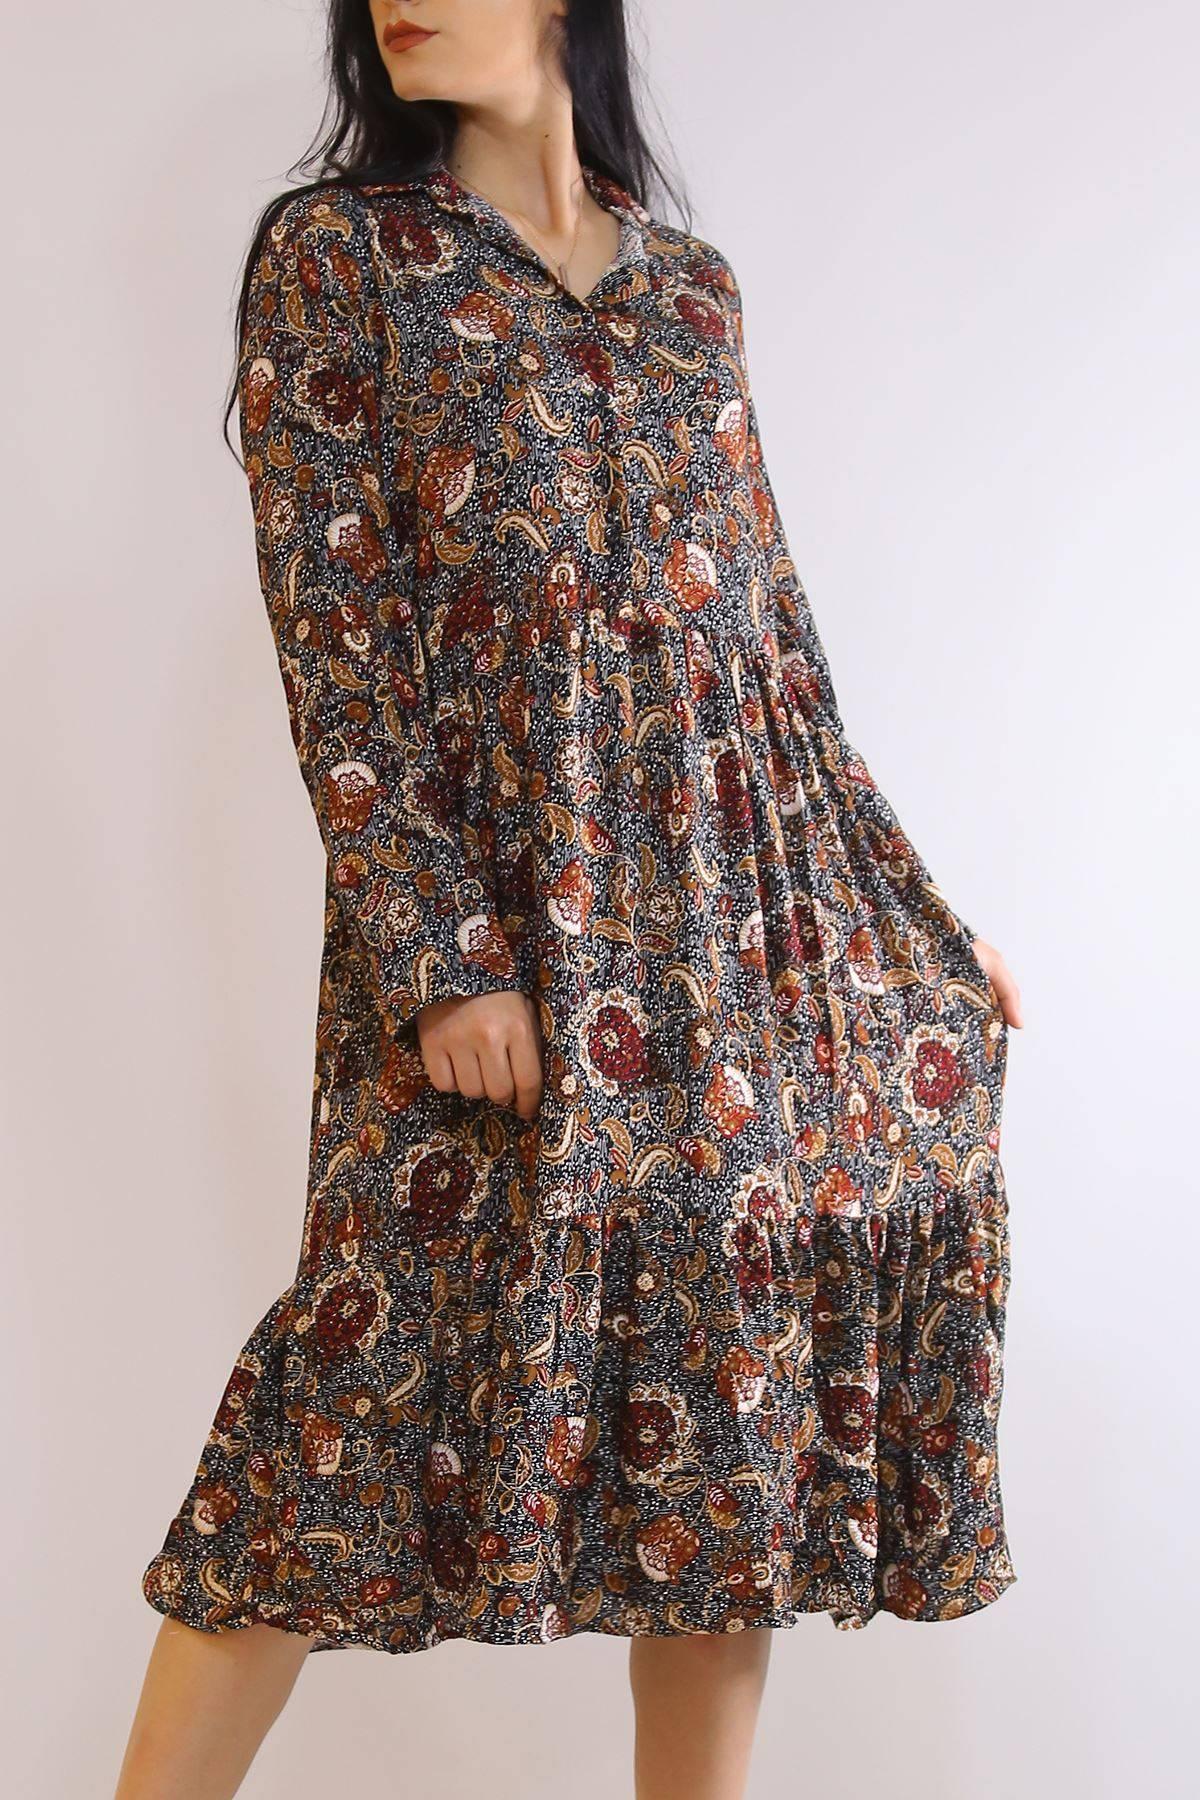 Katlama Kol Elbise Siyahbordo - 4807.701.